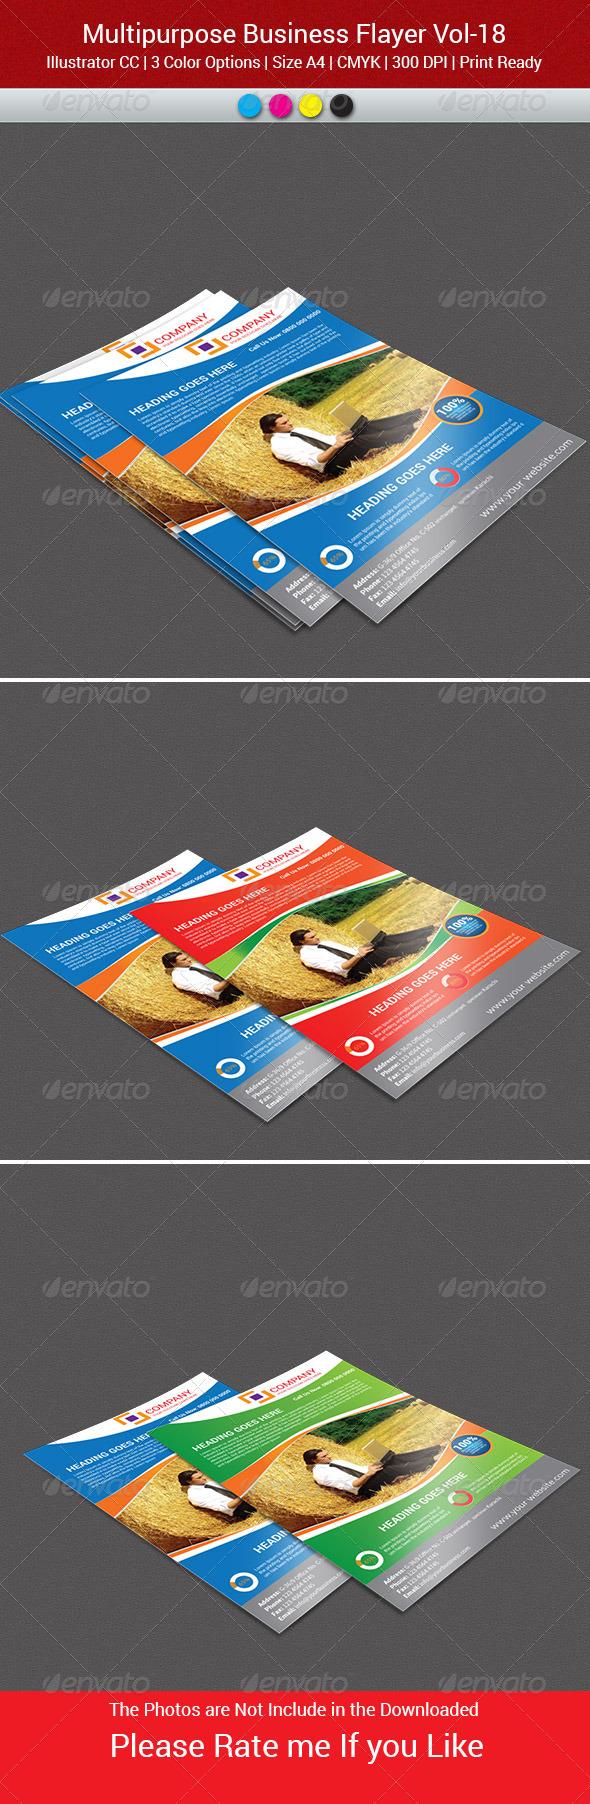 GraphicRiver MultiPurpose Business Flyer-Vol-18 7951642